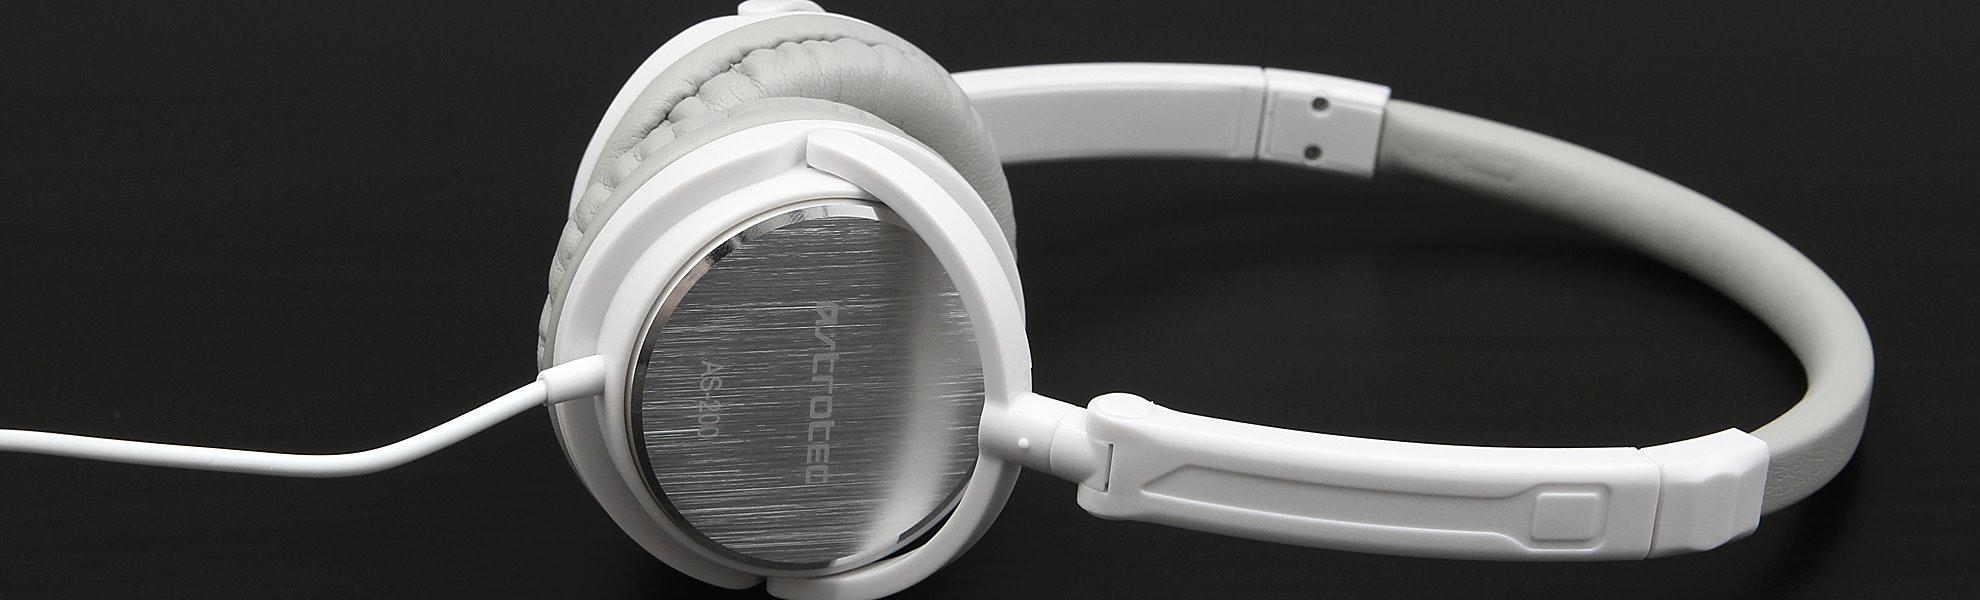 Astrotec AS200 On Ear Headphones